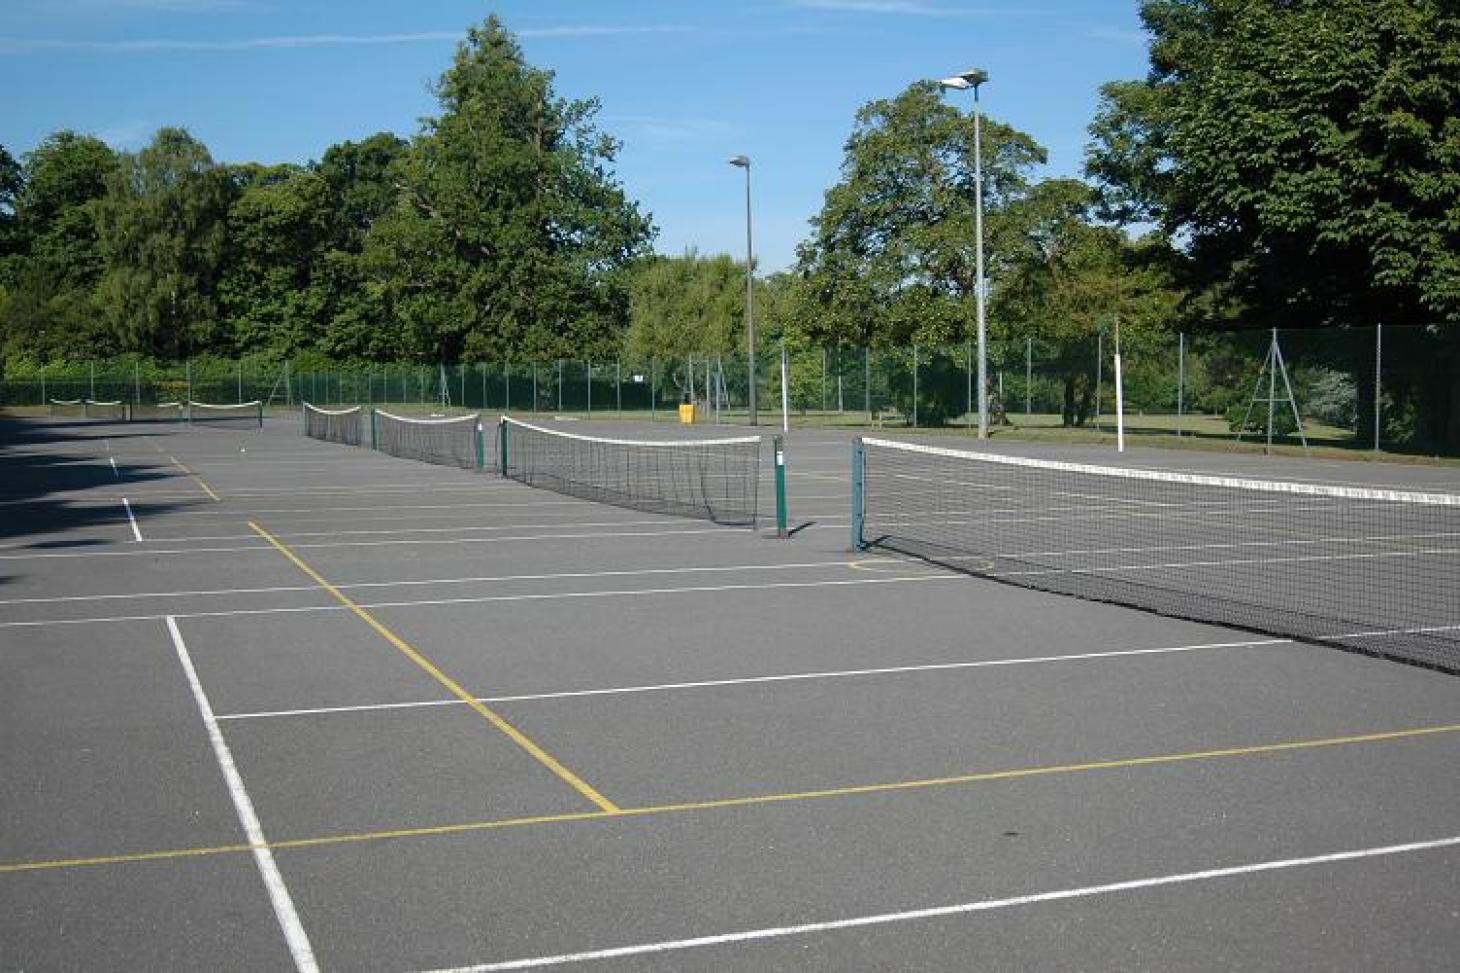 Croydon Sports Club Outdoor   Hard (macadam) tennis court